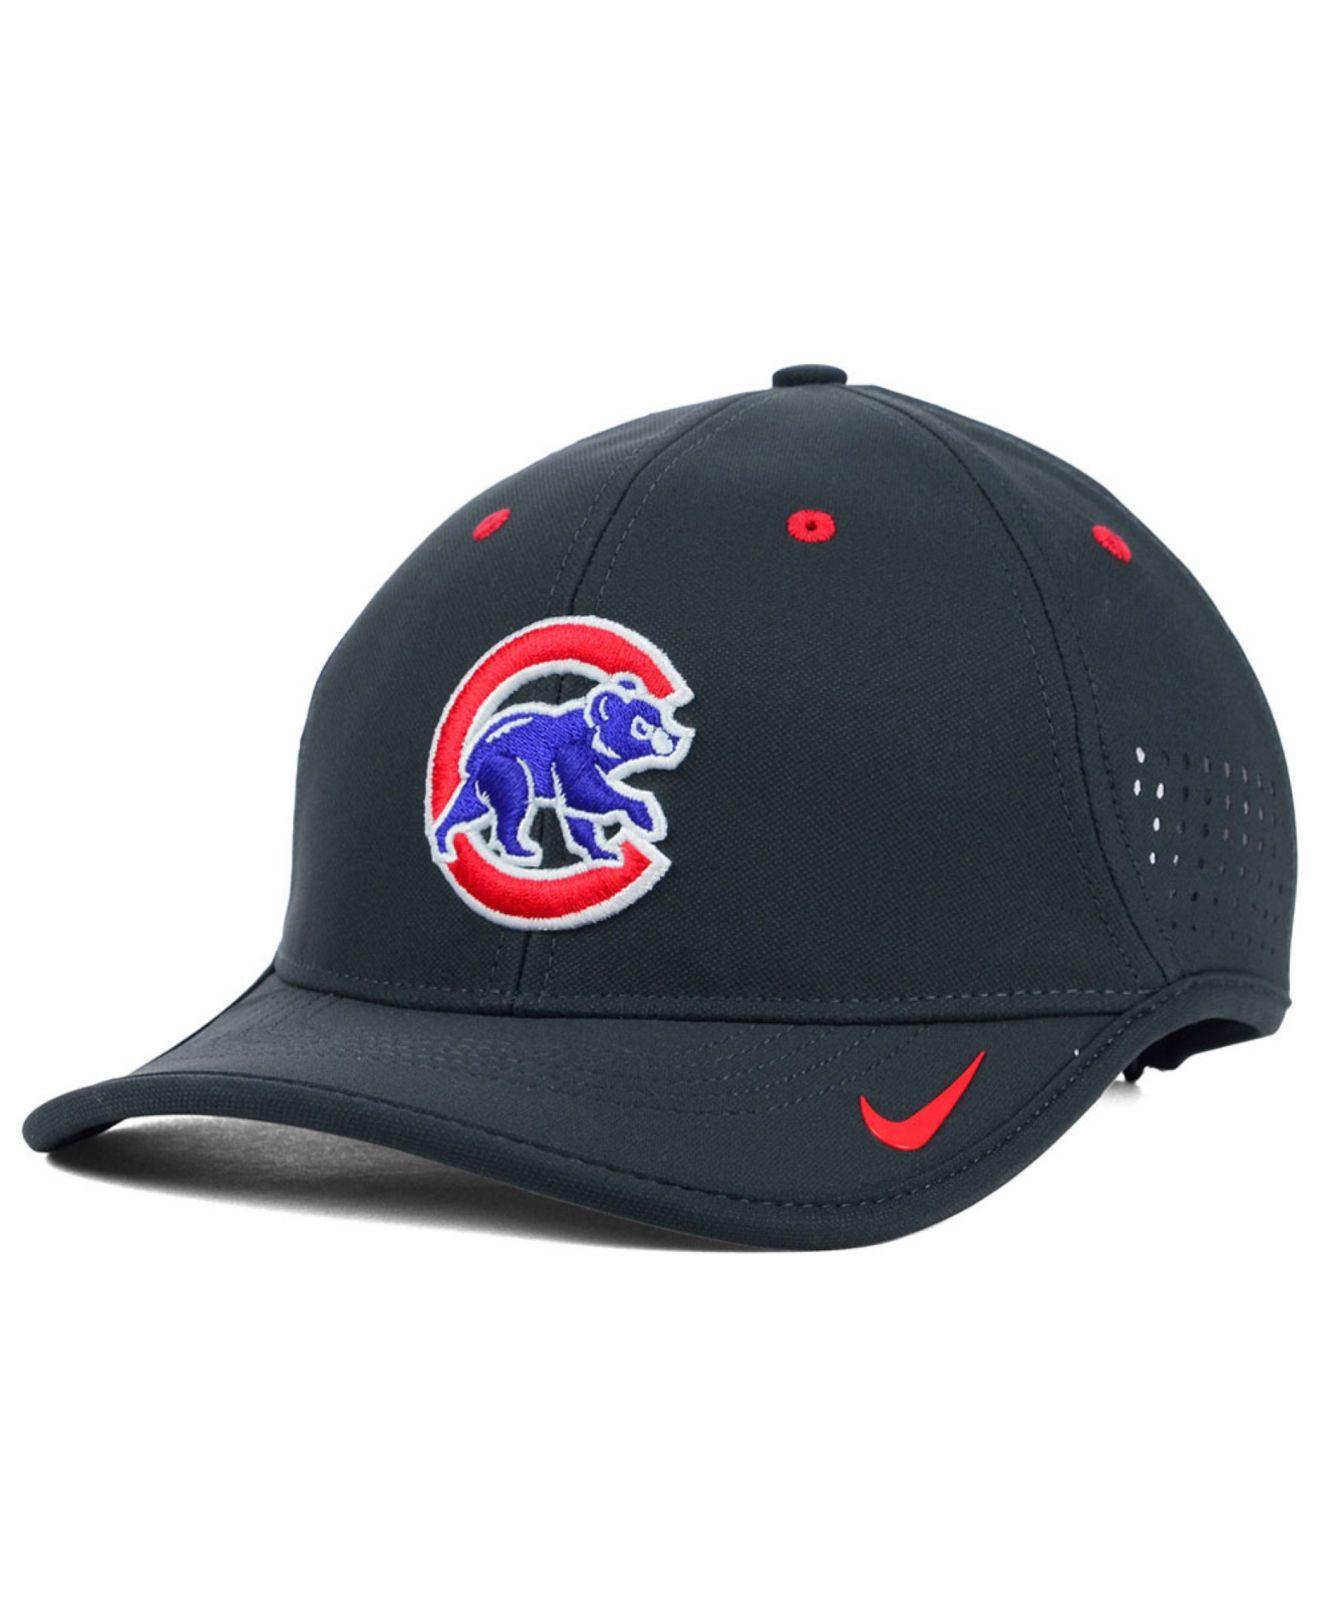 5df7eaab210 Lyst - Nike Chicago Cubs Vapor Swoosh Adjustable Cap in Gray for Men